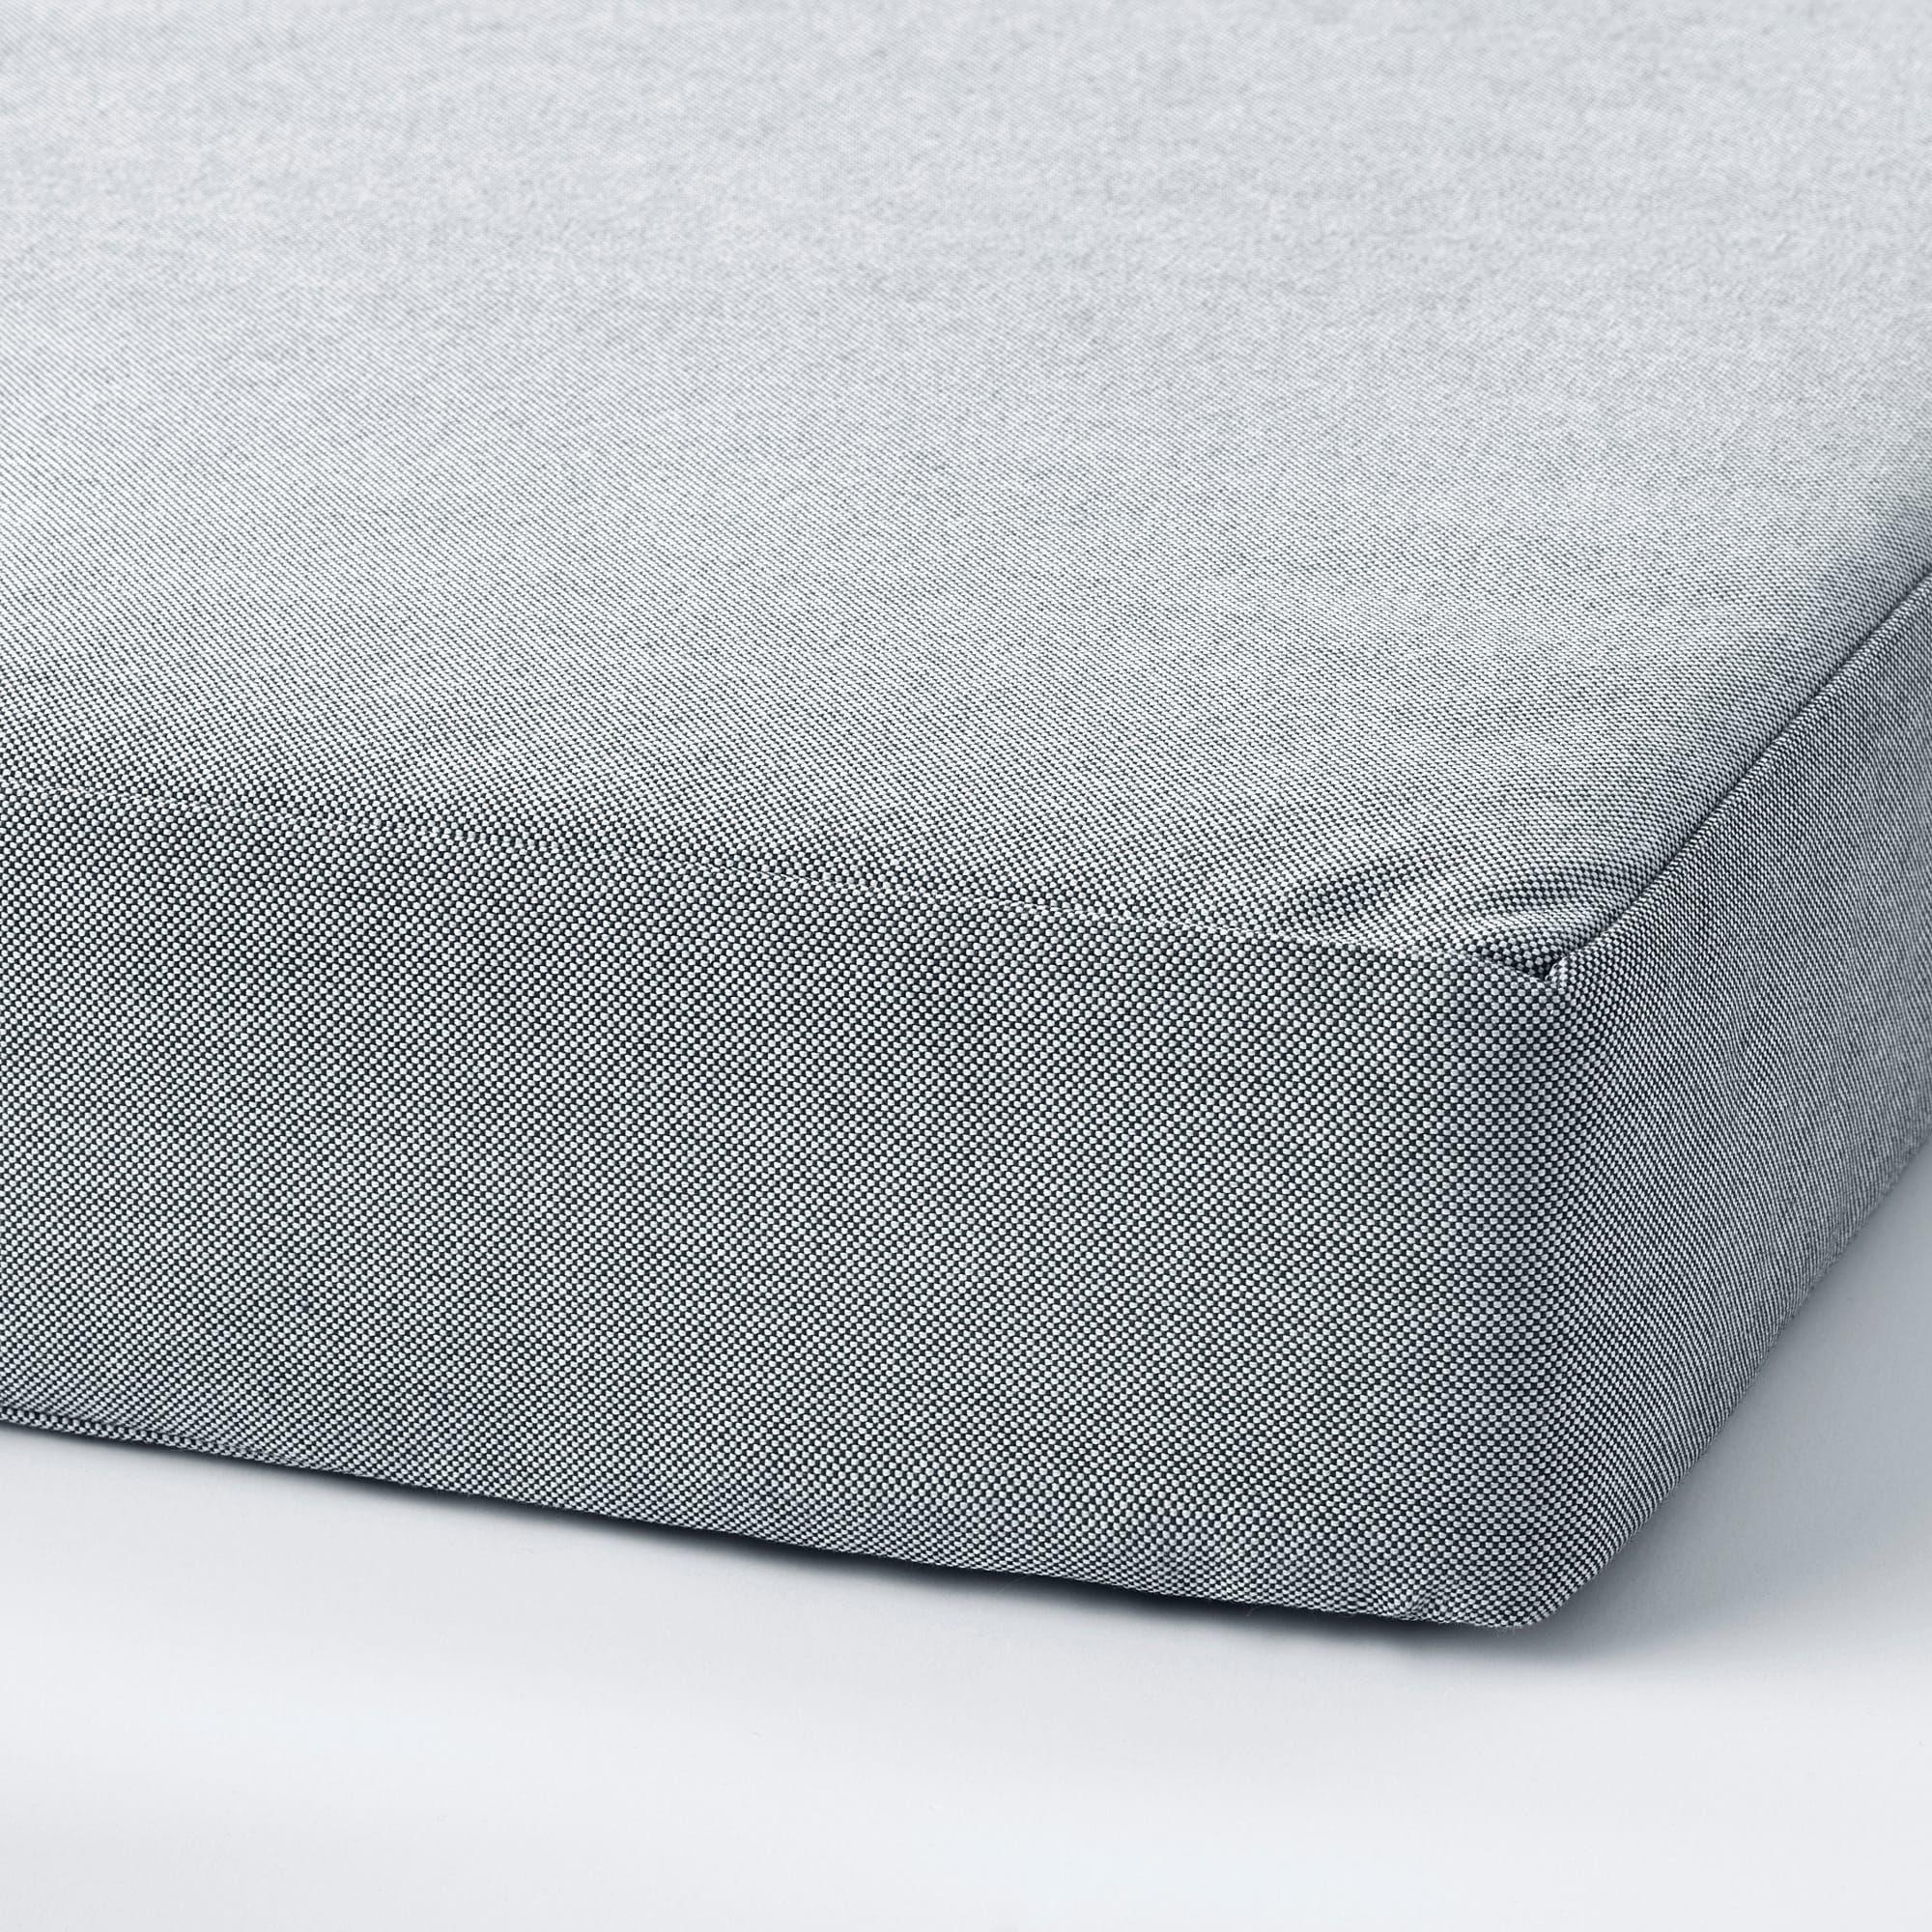 Slakt Mattress Folding Ikea In 2020 Mattress Soft Mattress Ikea